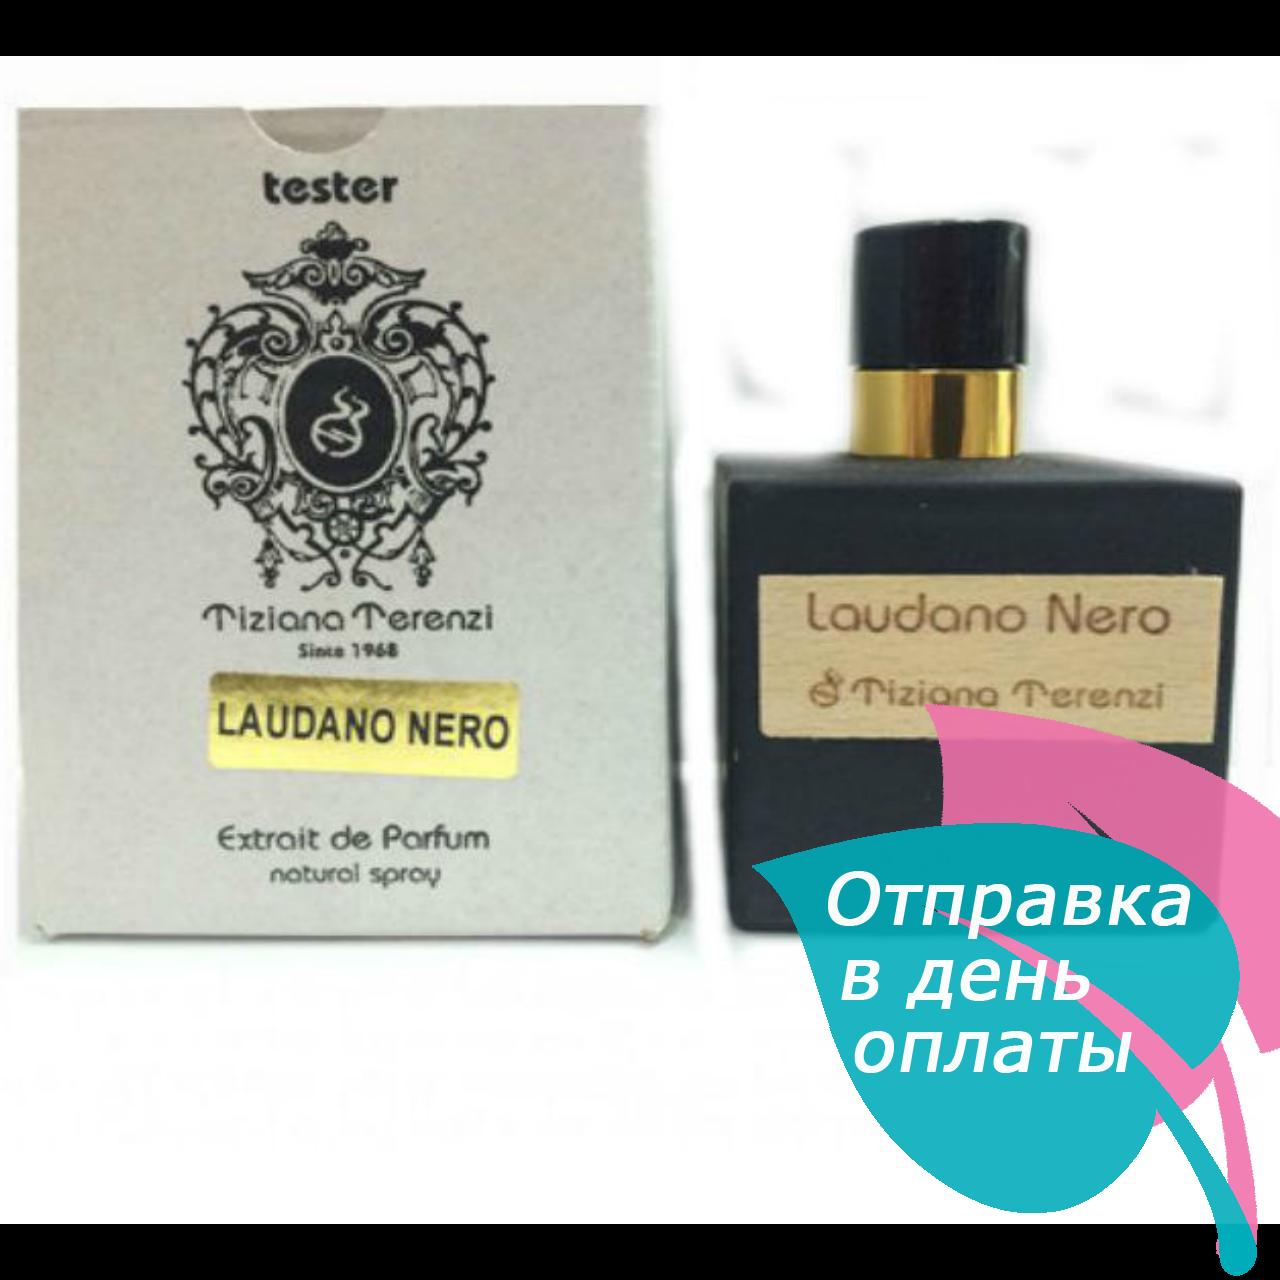 Tiziana Terenzi Laudano Nero EDP TESTER унисекс,100 мл